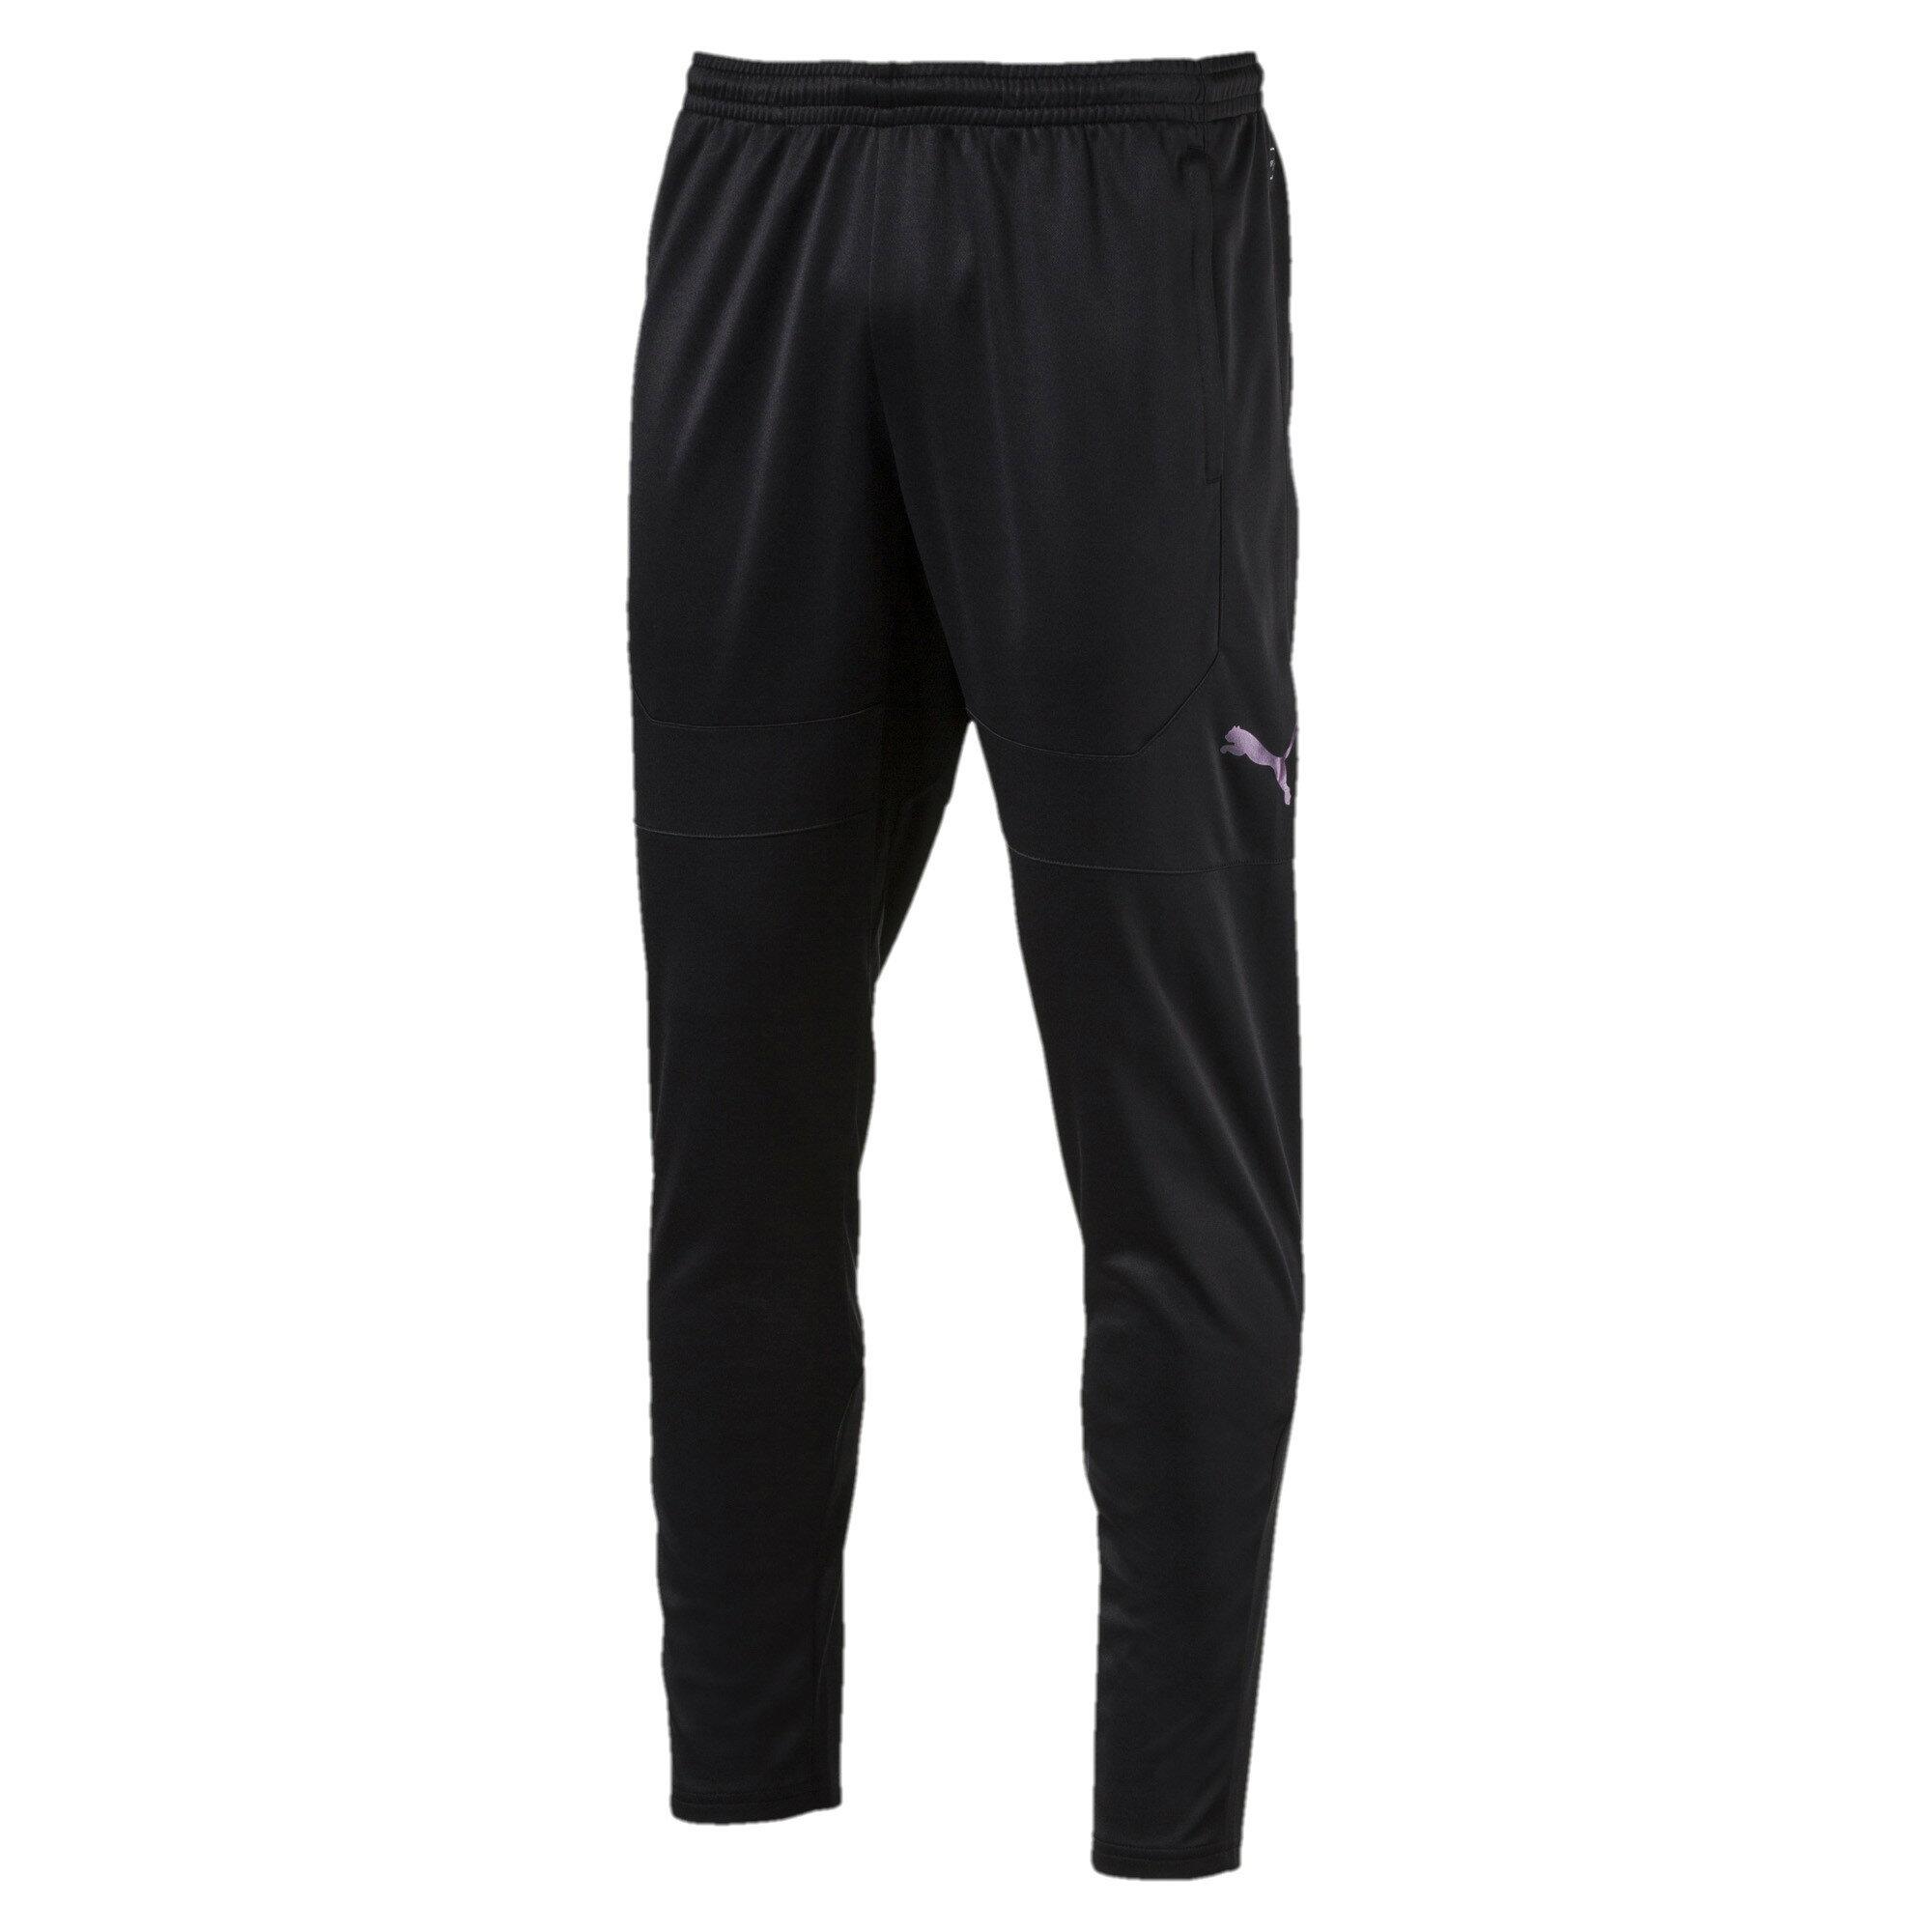 eec22c674c3f Official Puma Store  PUMA ftblNXT Men s Training Pants